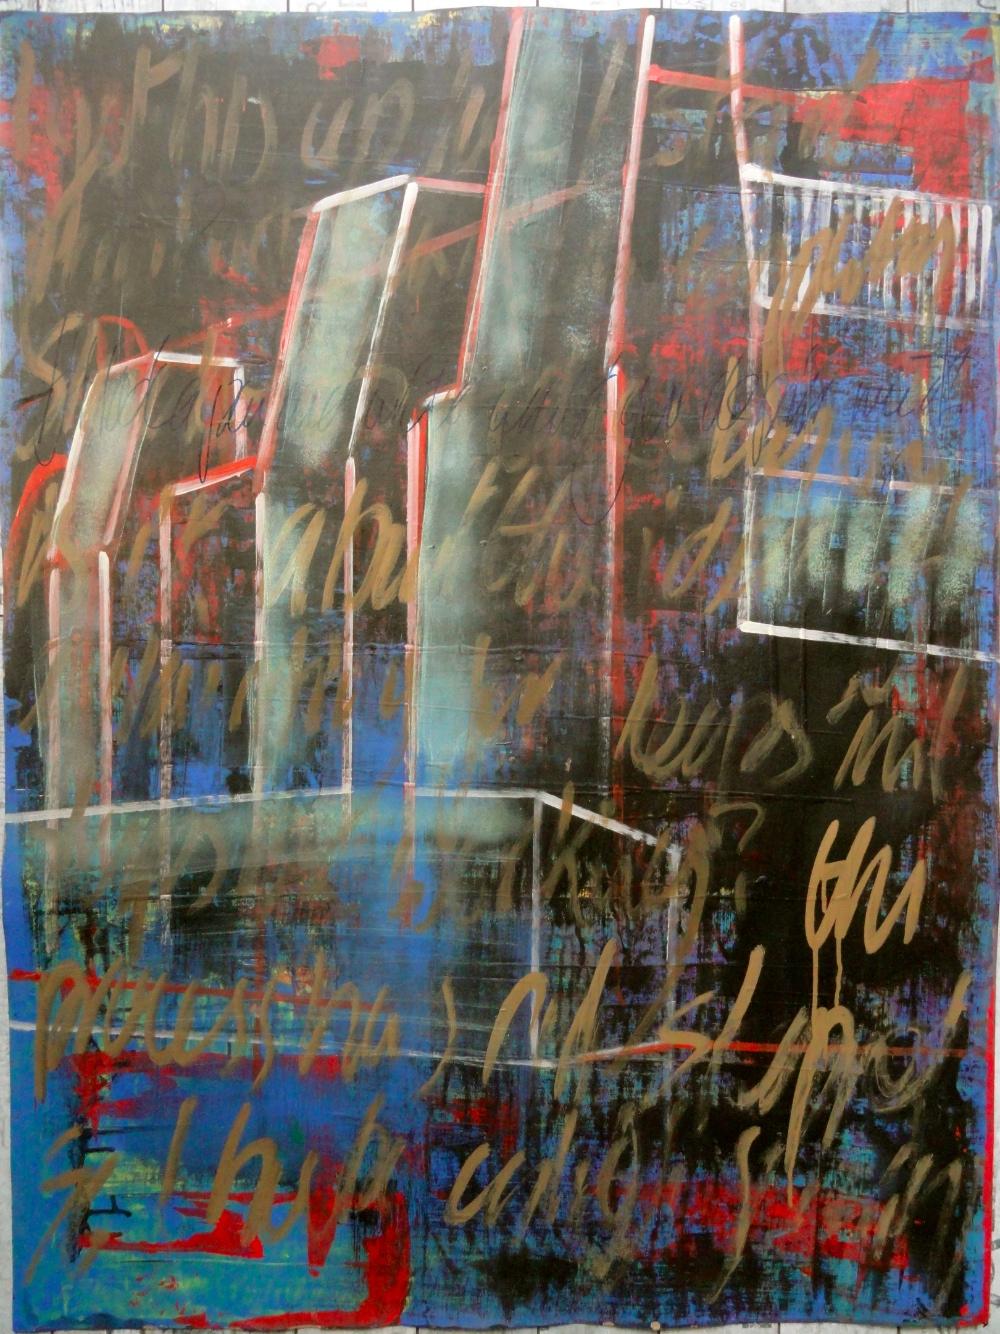 Cheryl Penn Painting asemic writing